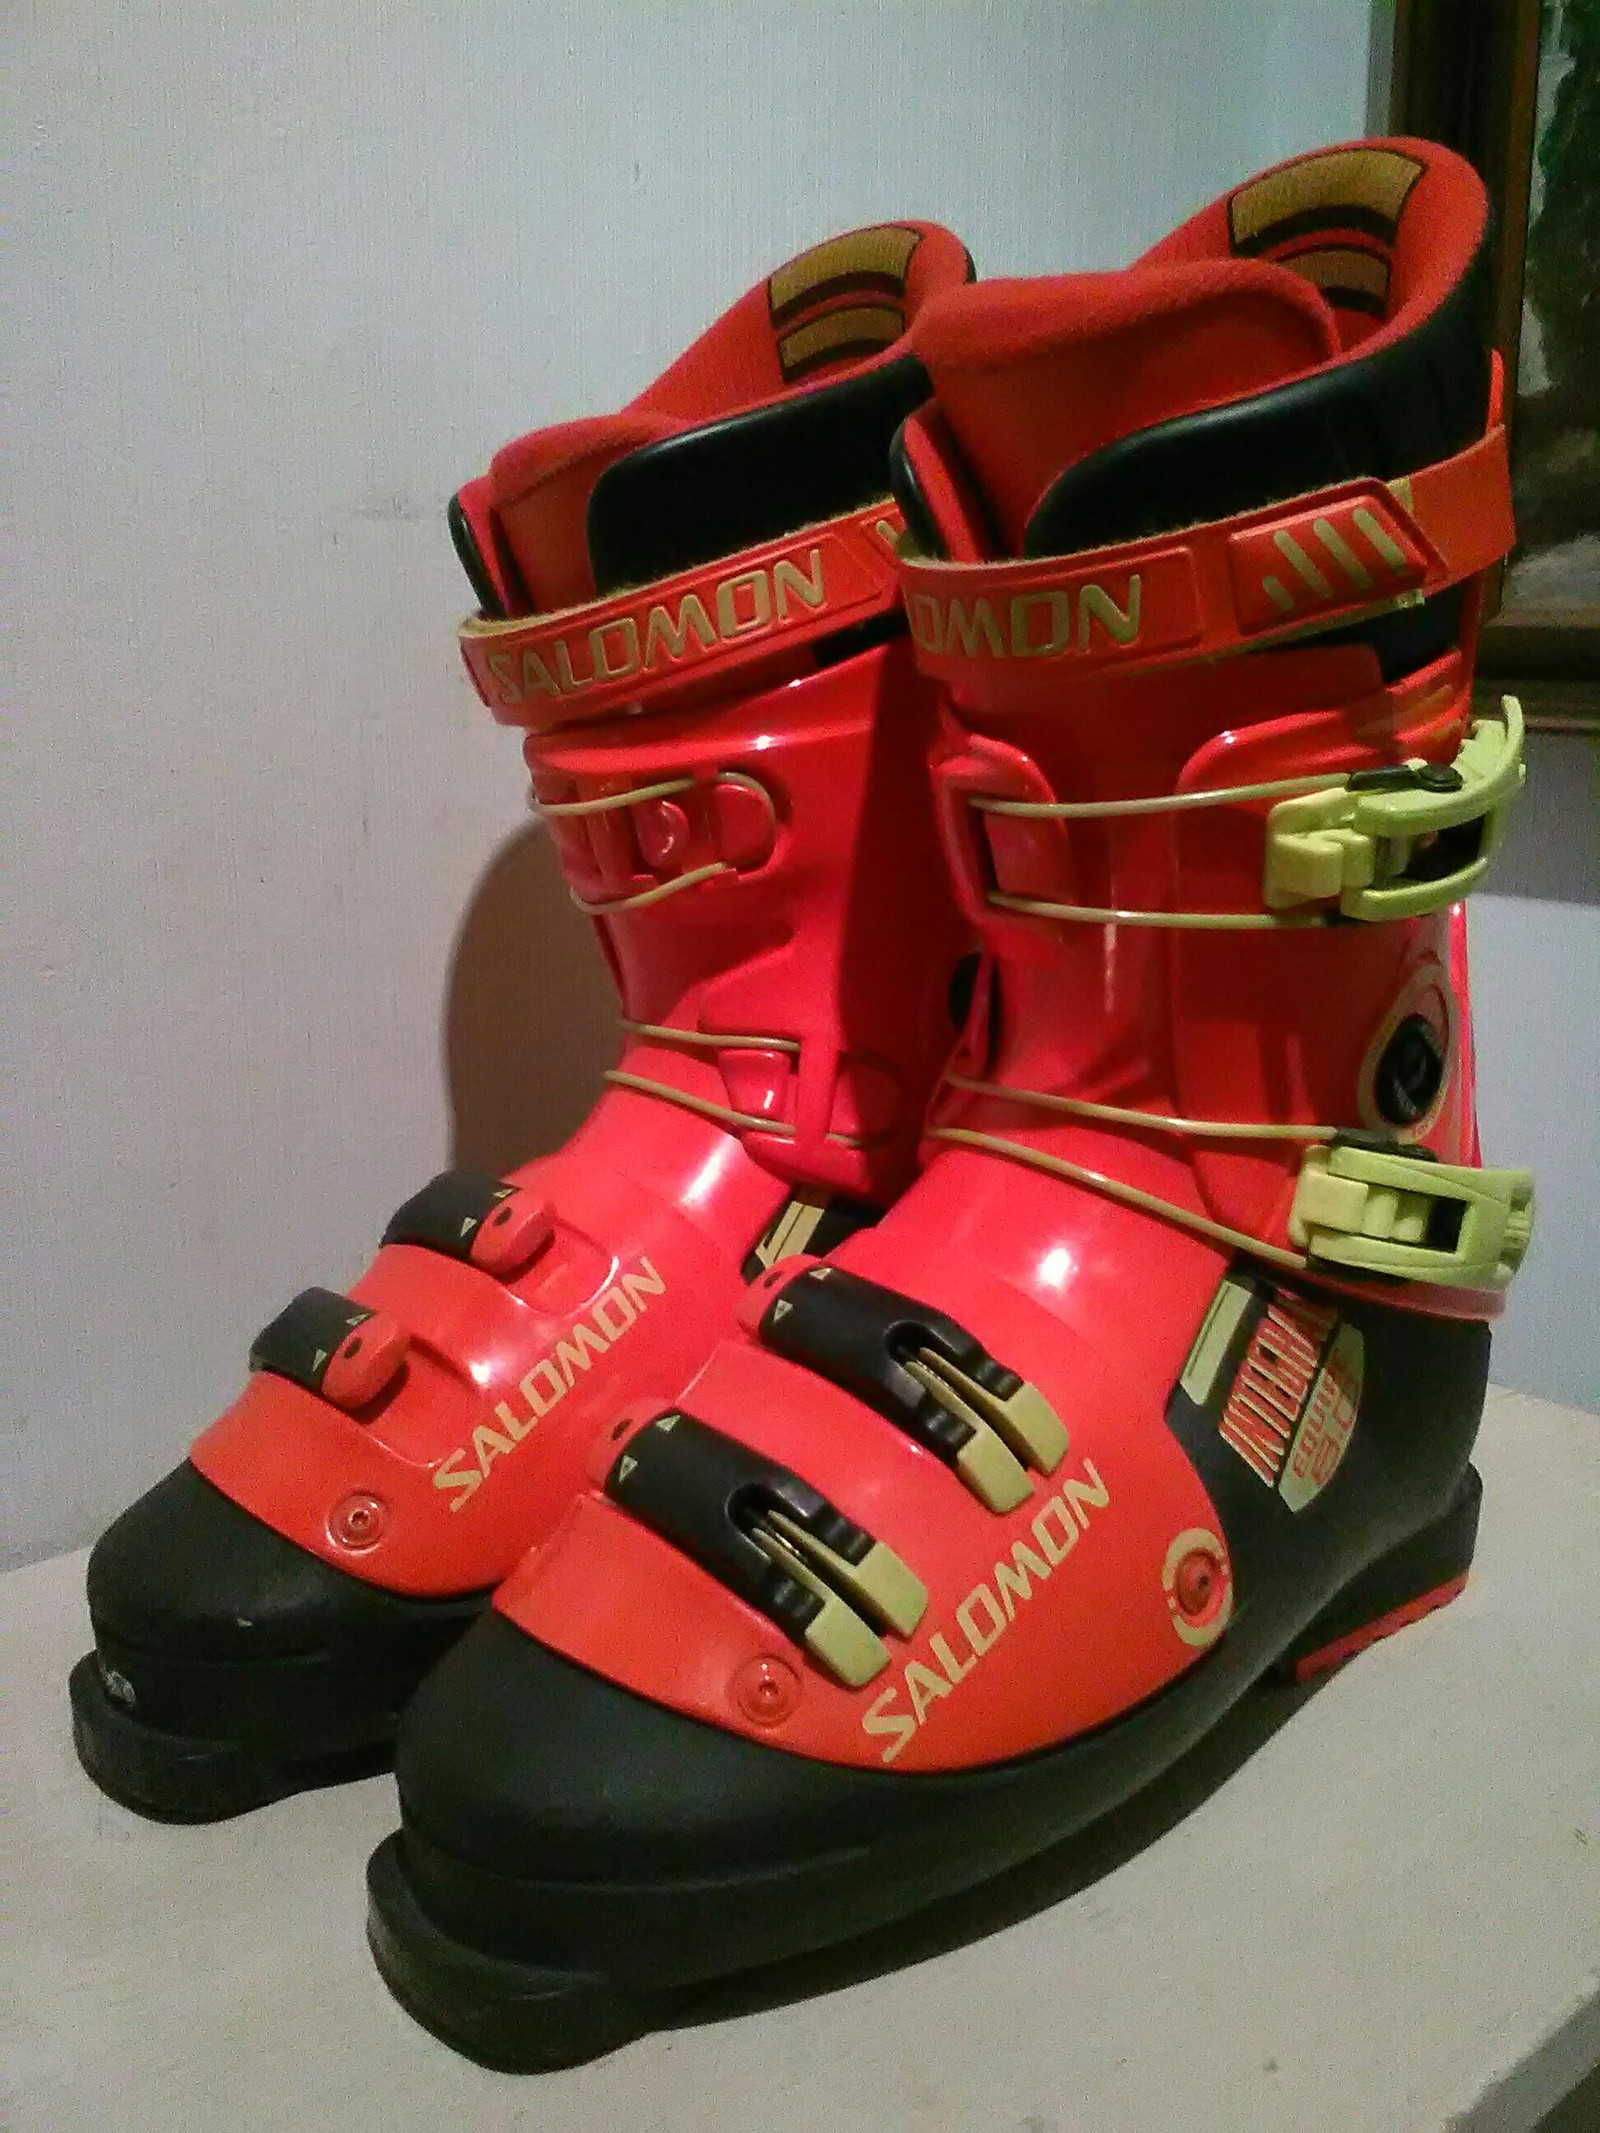 Salomon Integral Equipe 8.0 Racing alpinstøvler str. 45